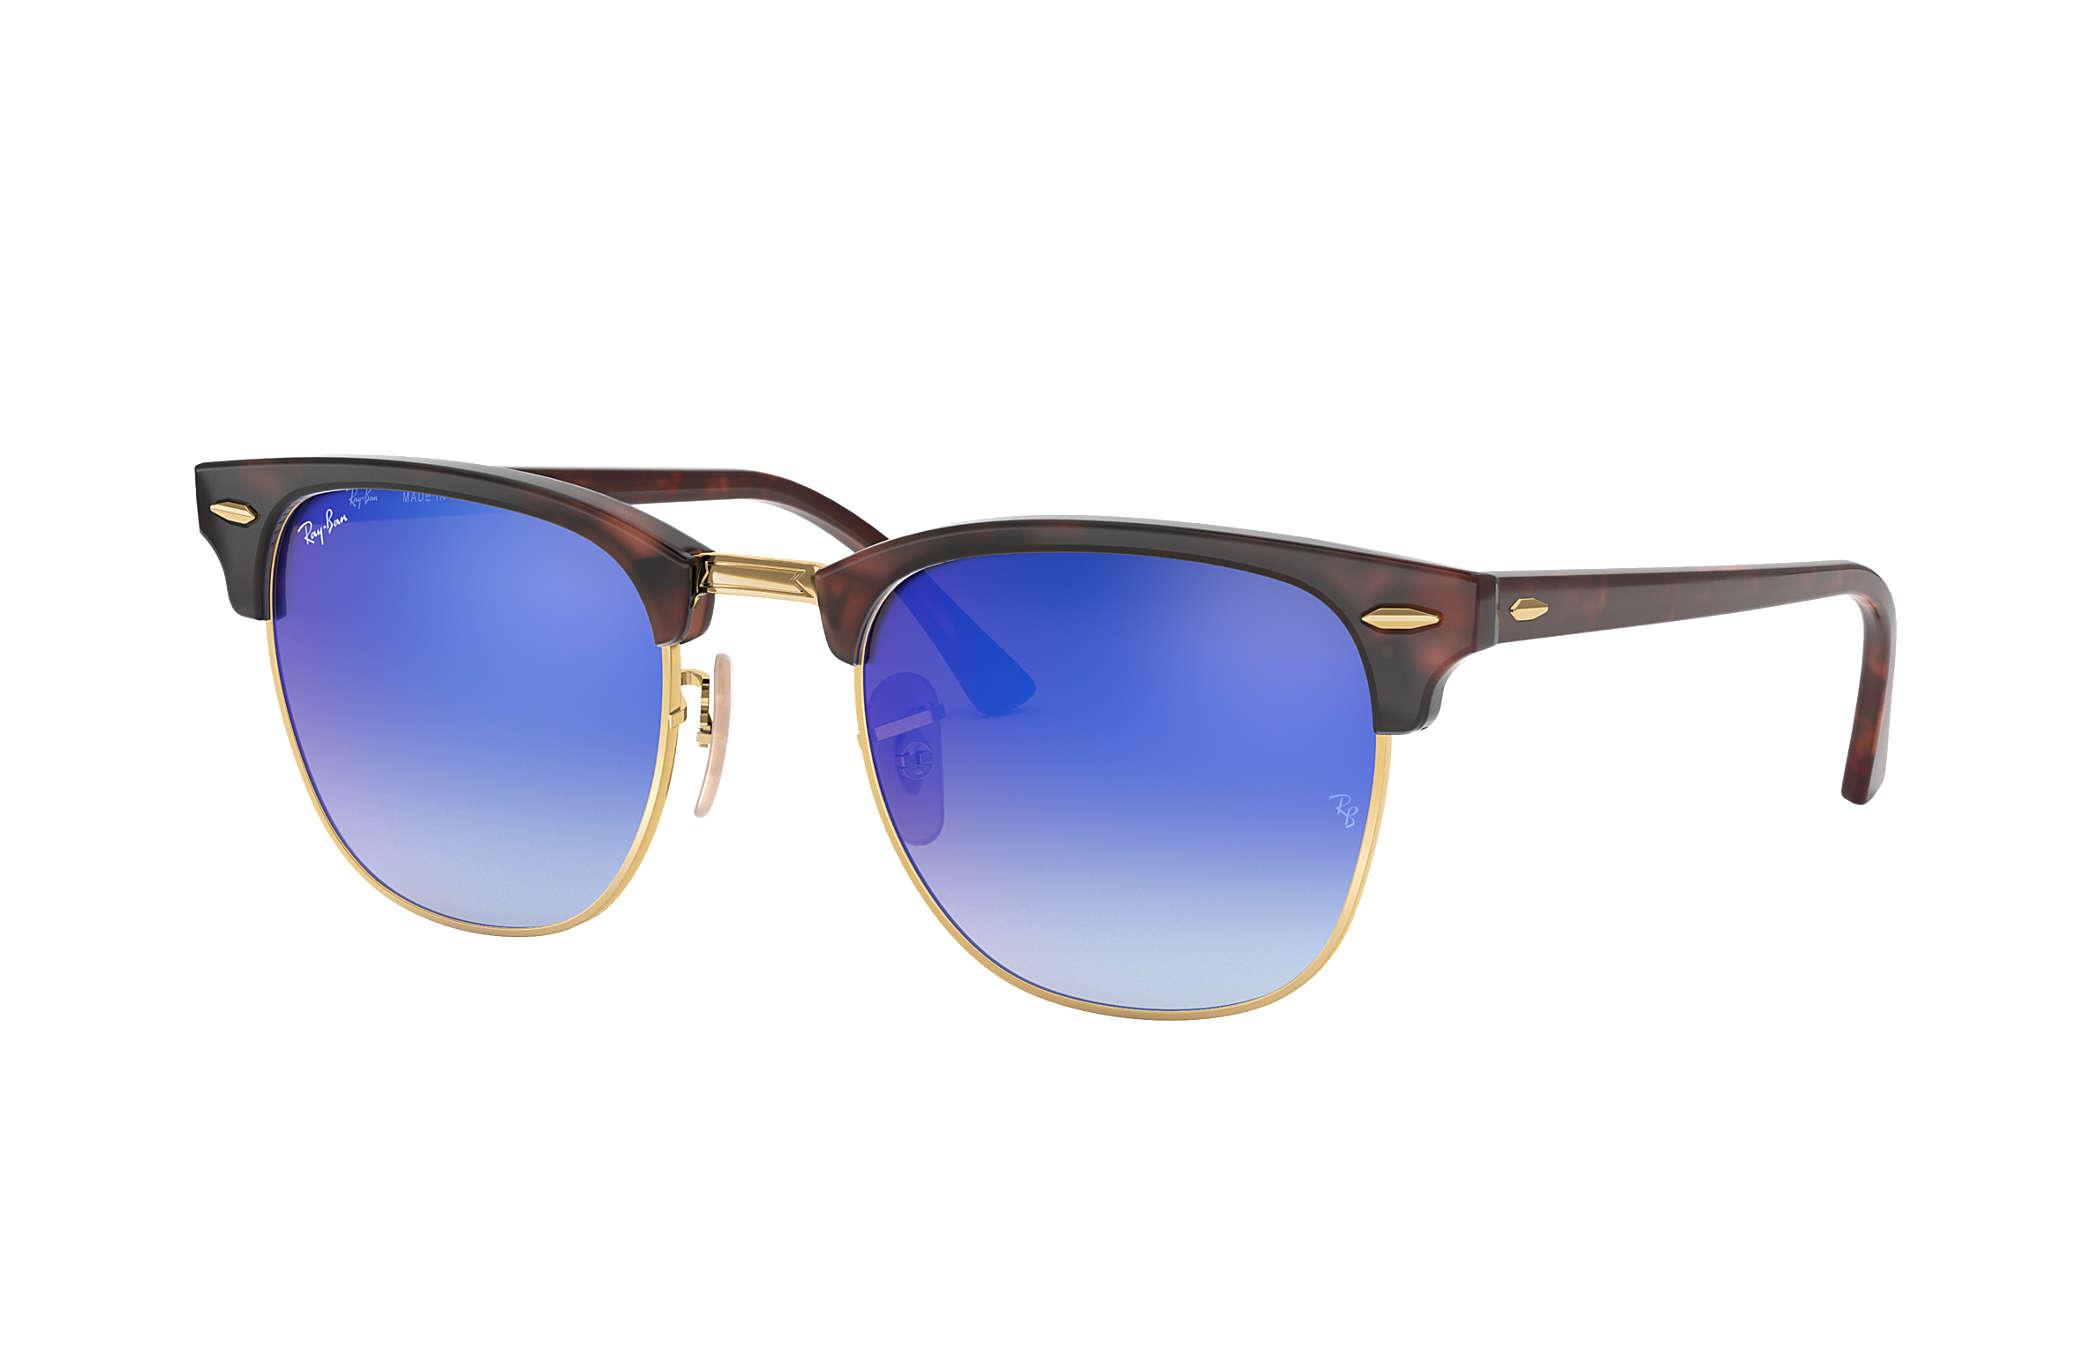 Ray ban sunglasses gradient - Ray Ban 0rb3016 Clubmaster Flash Lenses Gradient Tortoise Gold Tortoise Sun